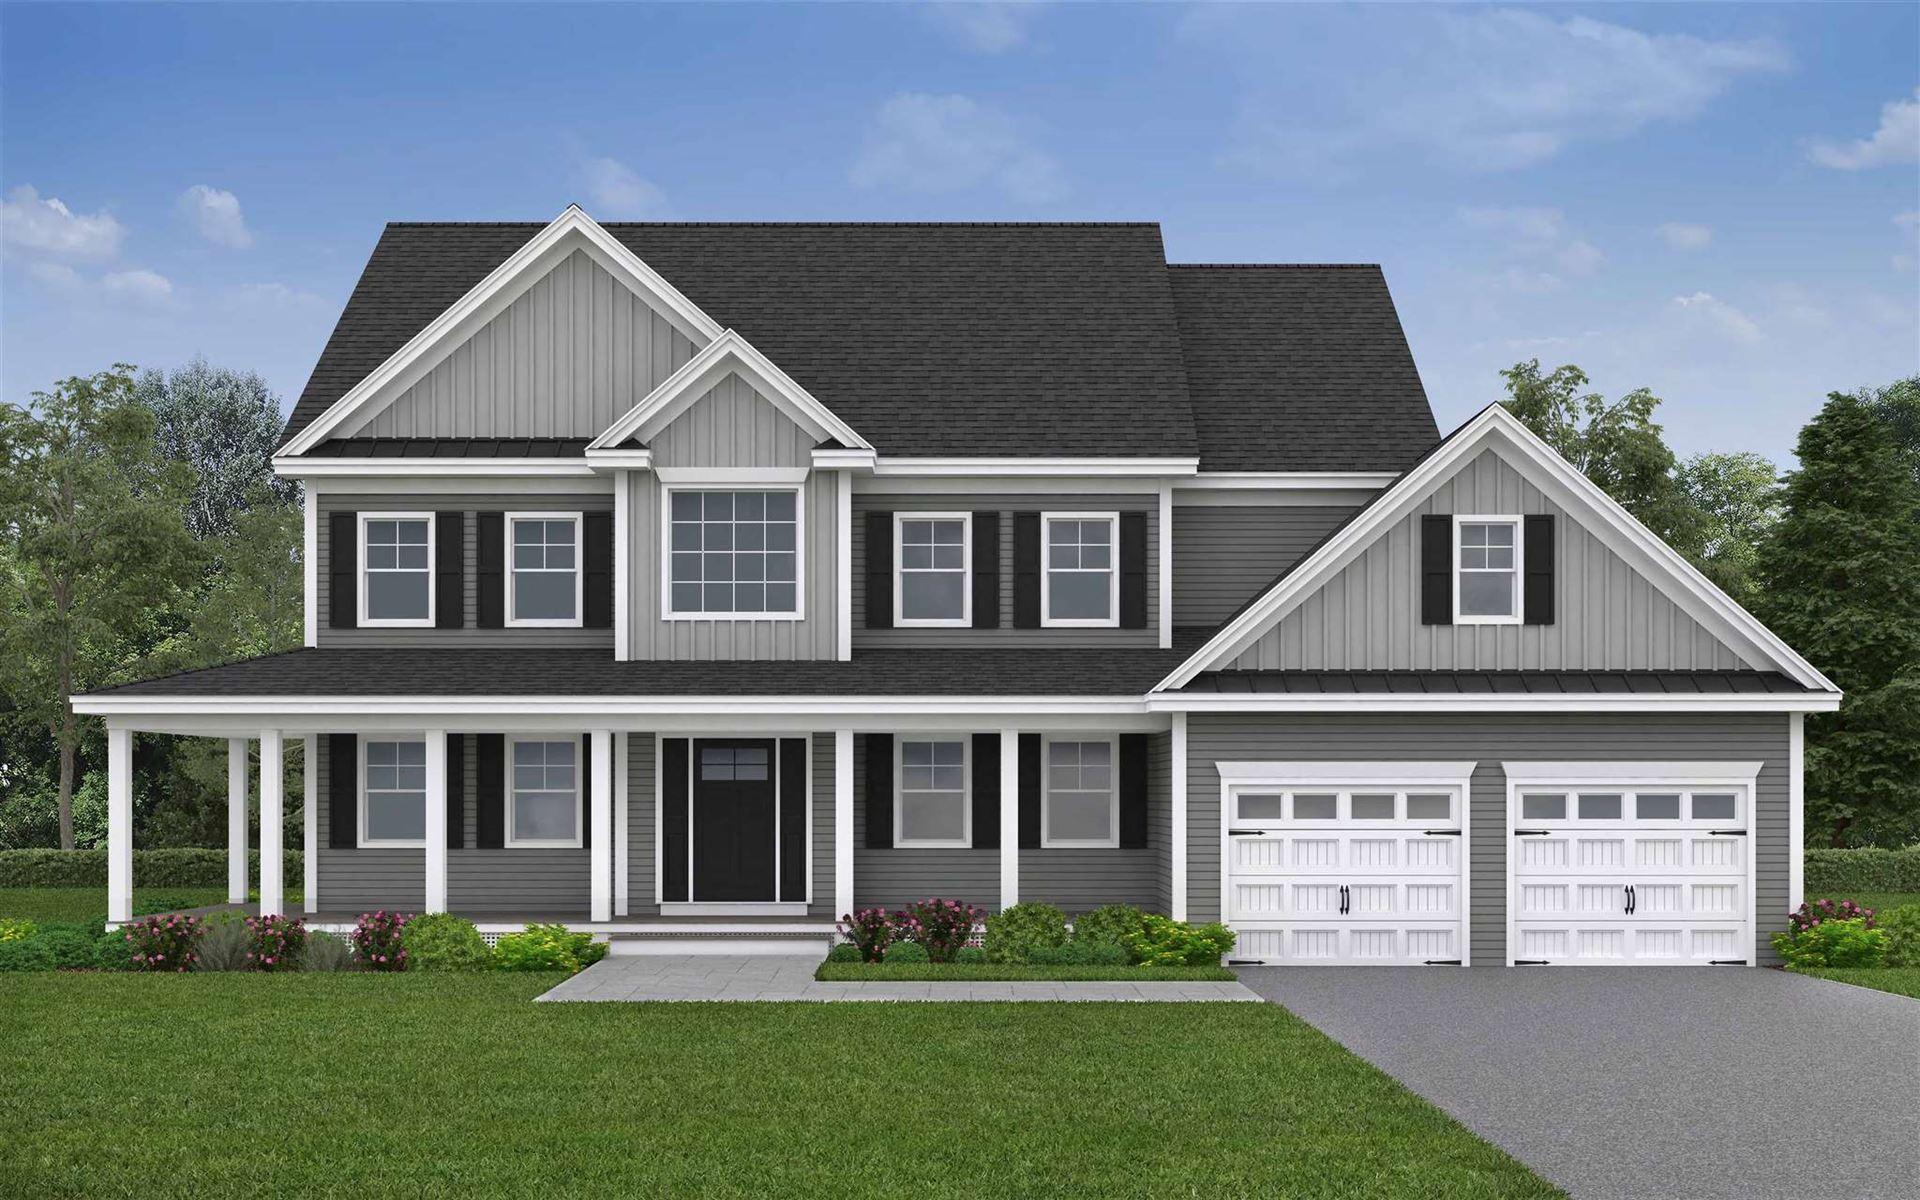 21 Caymus Ridge, Salem, NH 03079 - MLS#: 4807778